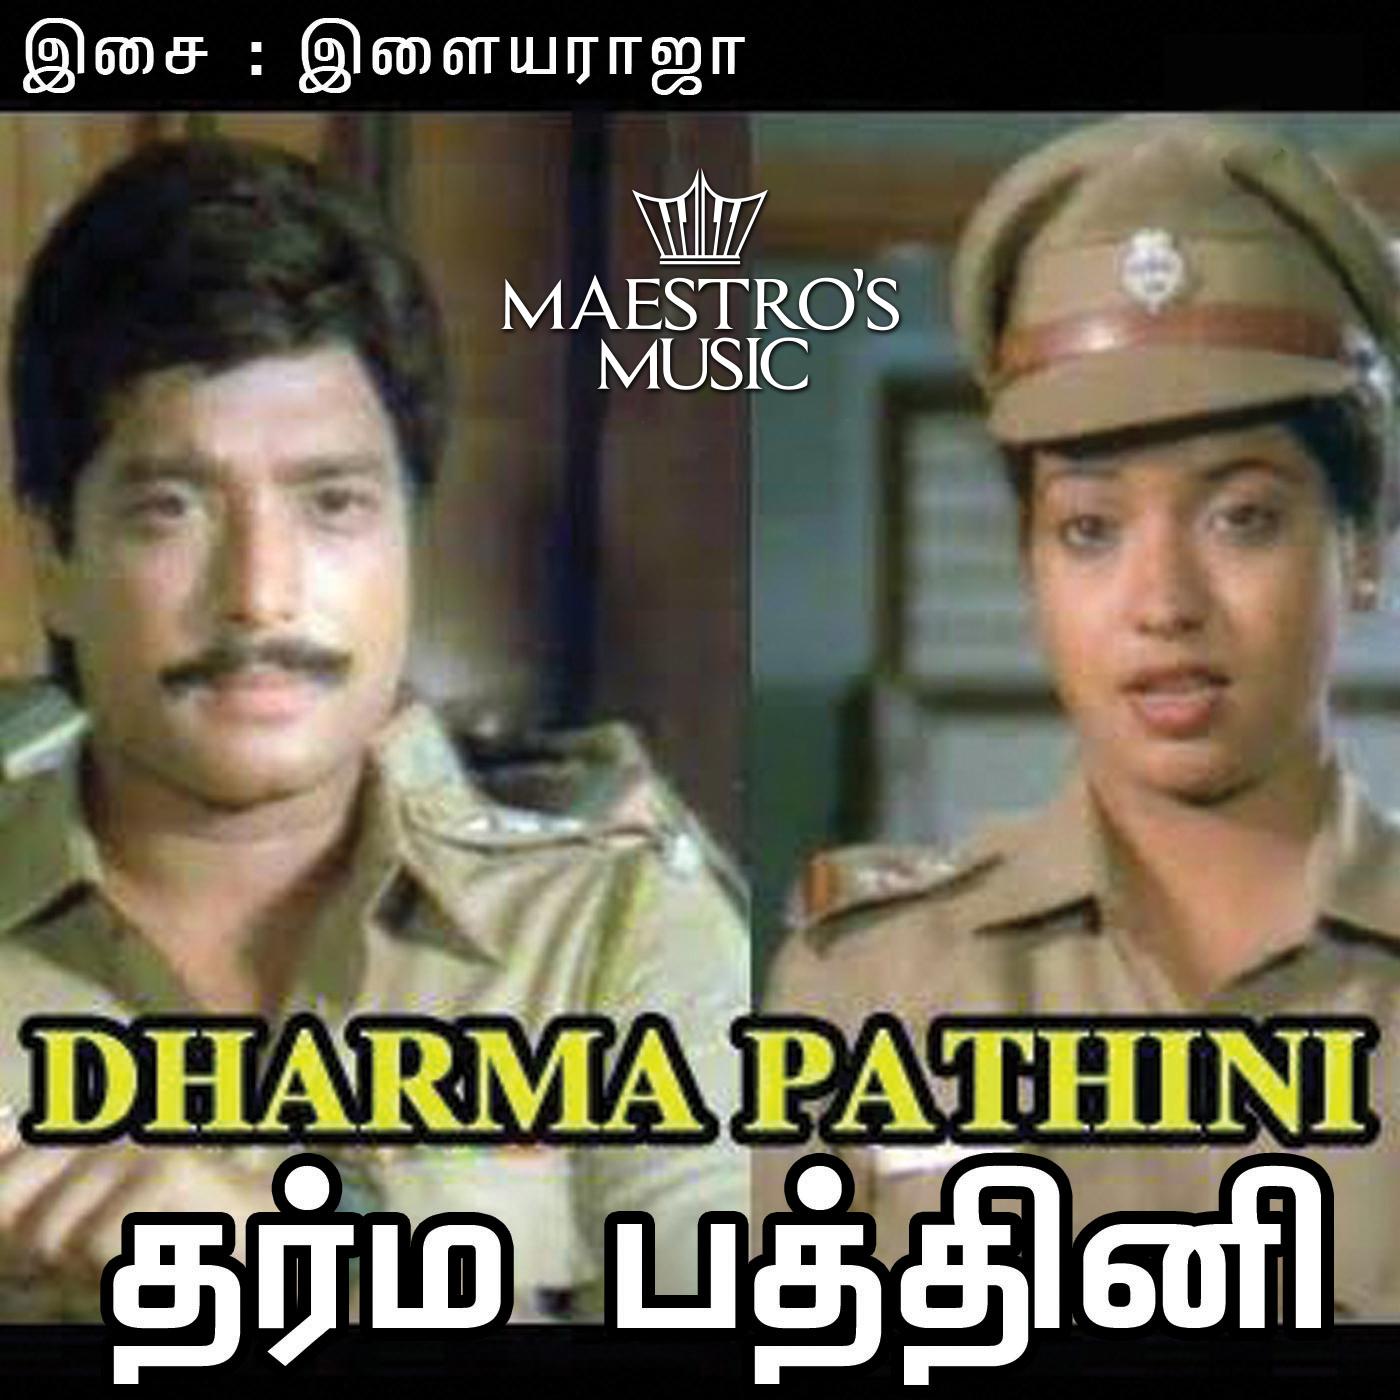 Dharma Pathni ((1986))